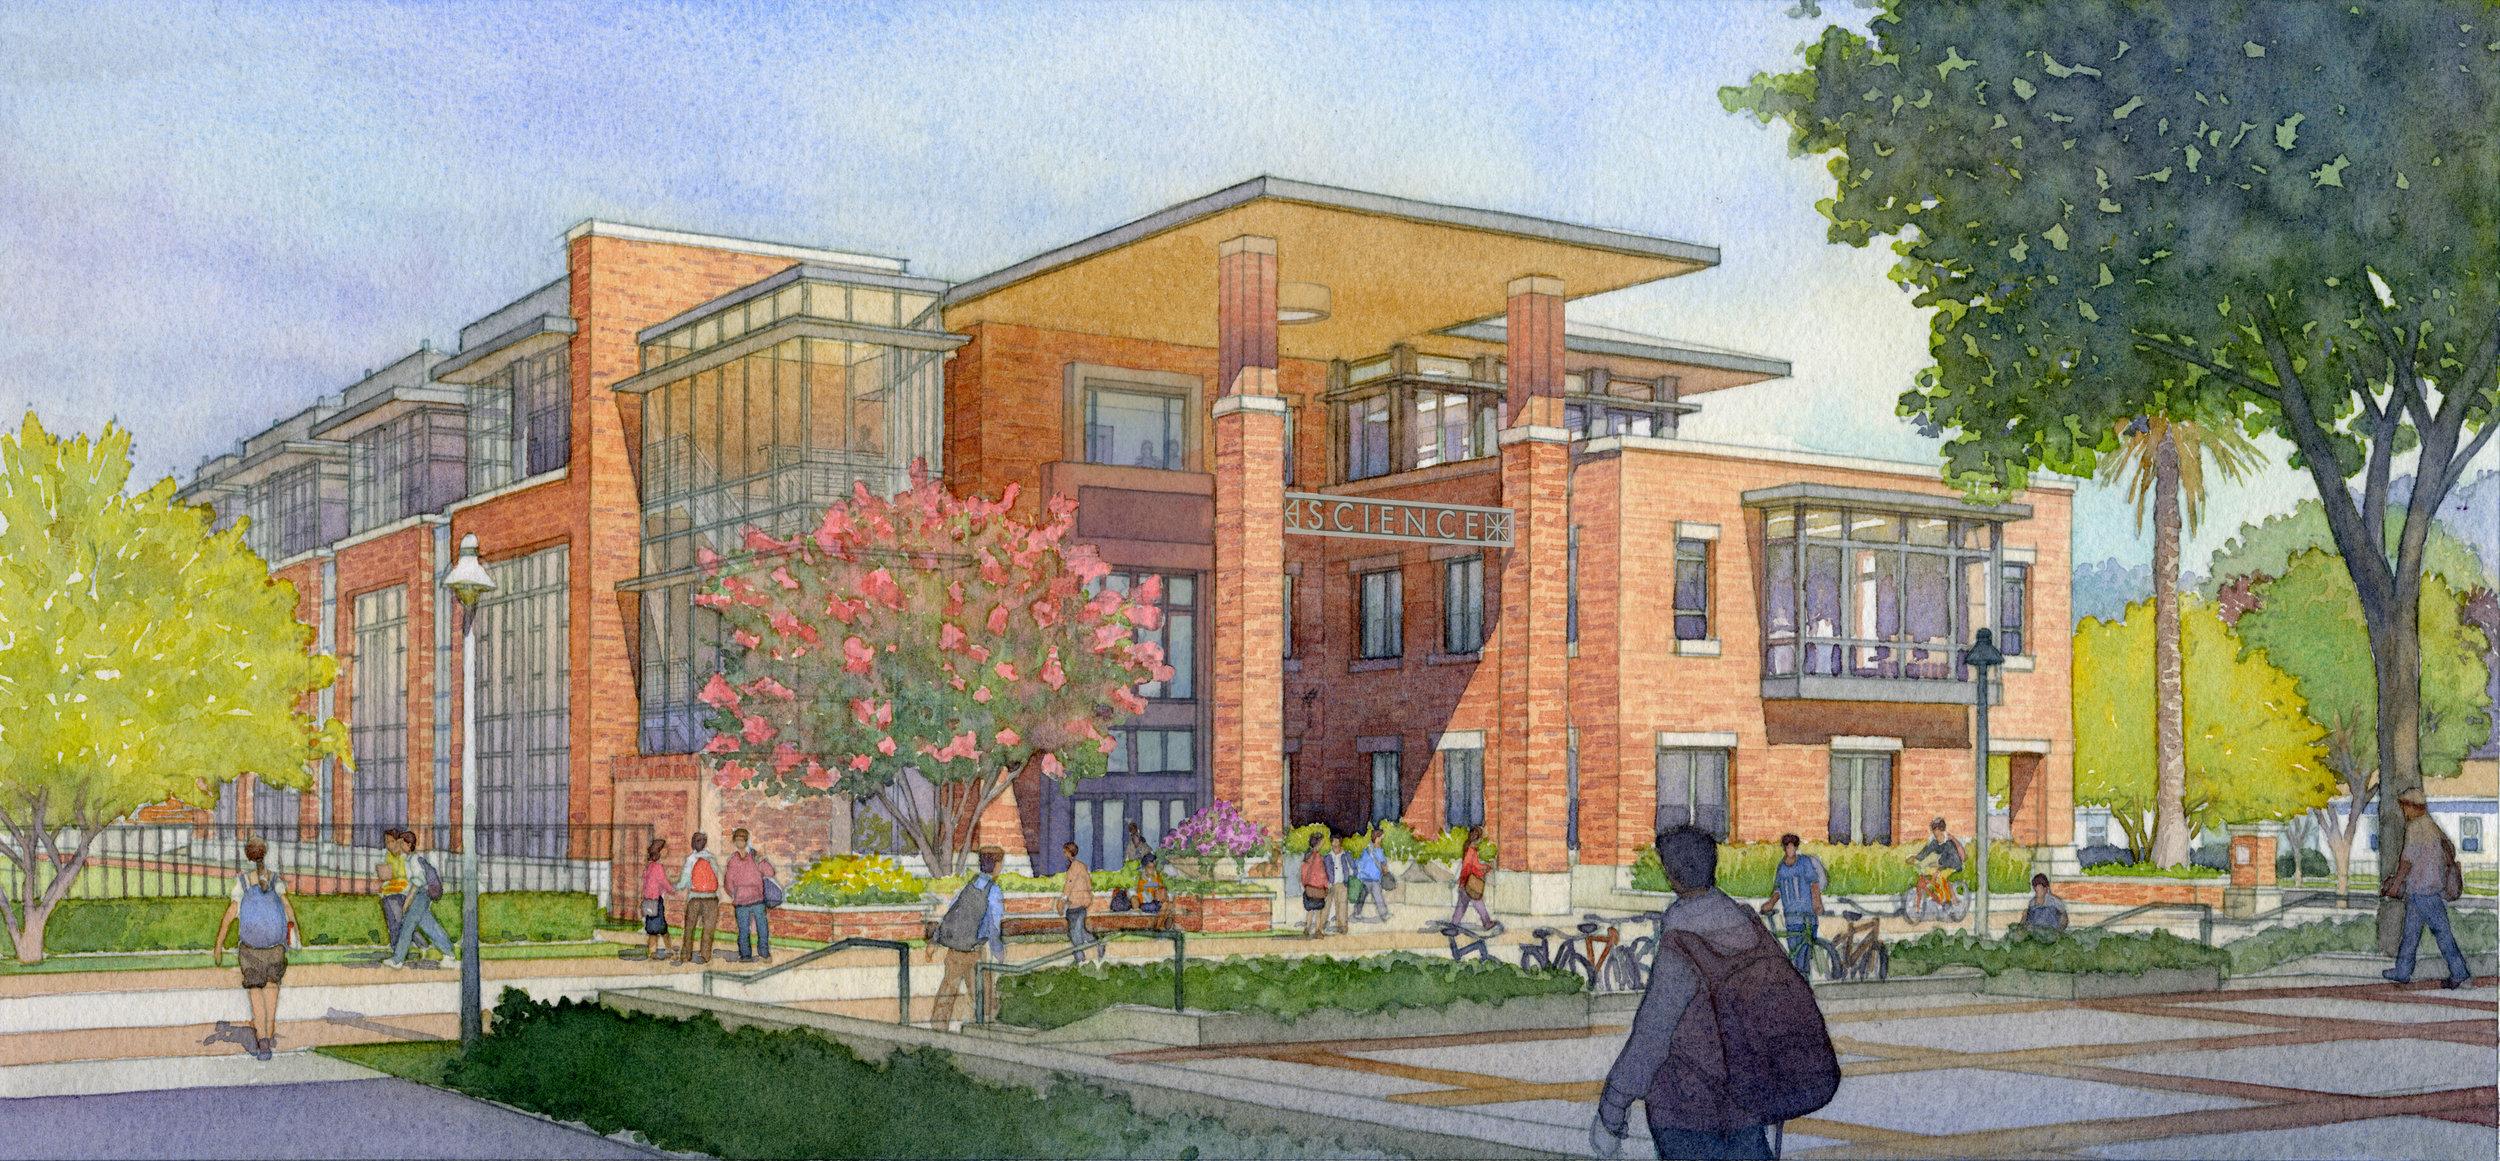 chapman university science center - Orange, California